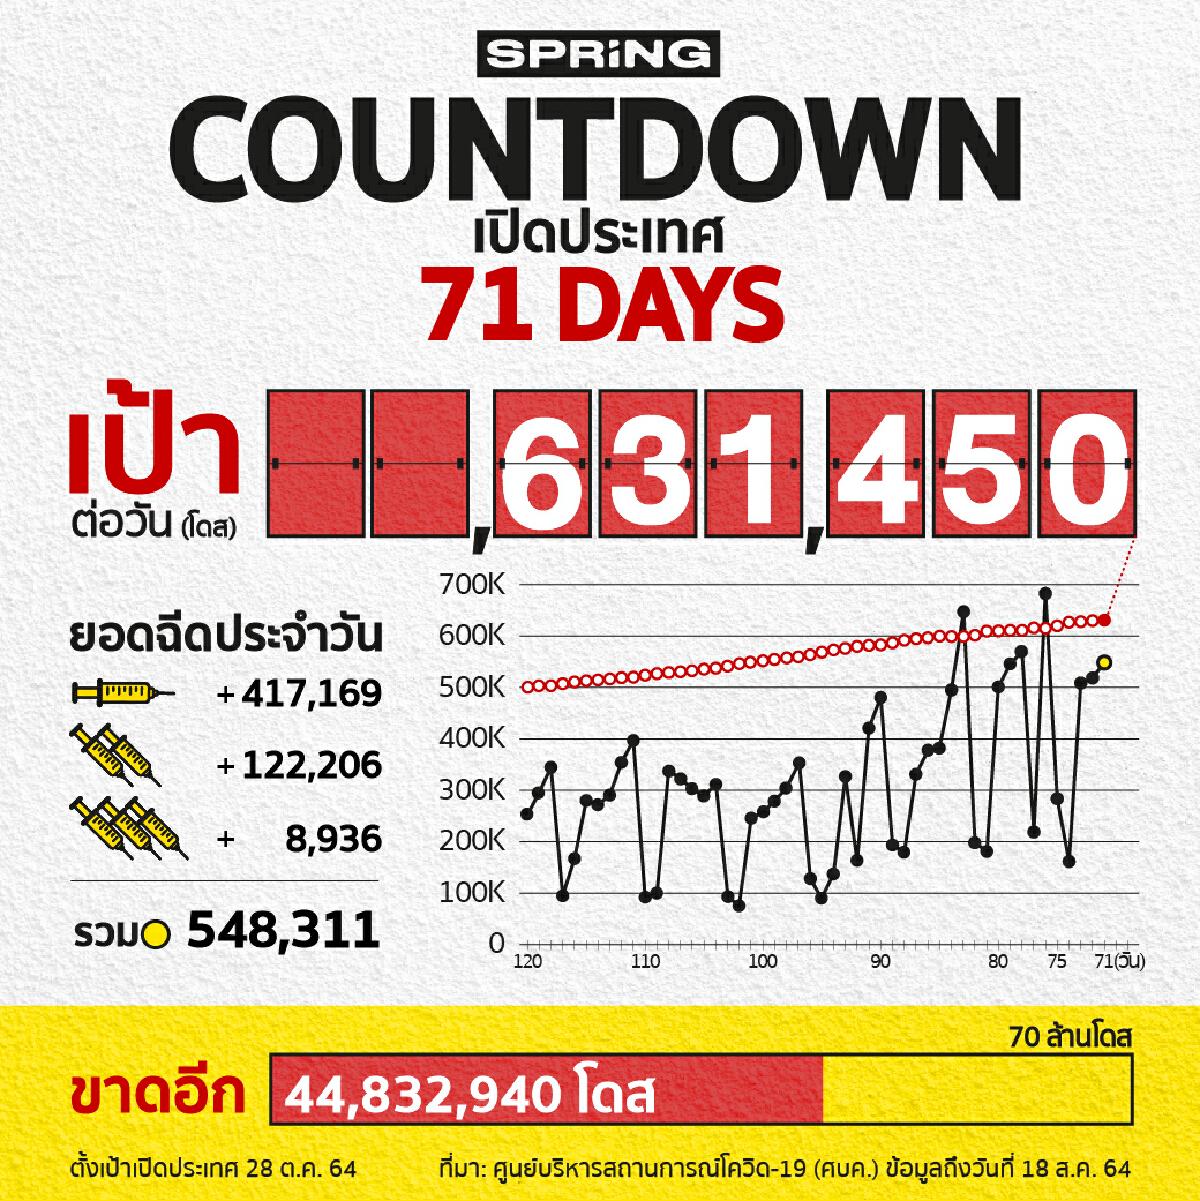 COUNTDOWN! เปิดประเทศใน 71 วัน ฉีดวัคซีนโควิด 548,311 โดส